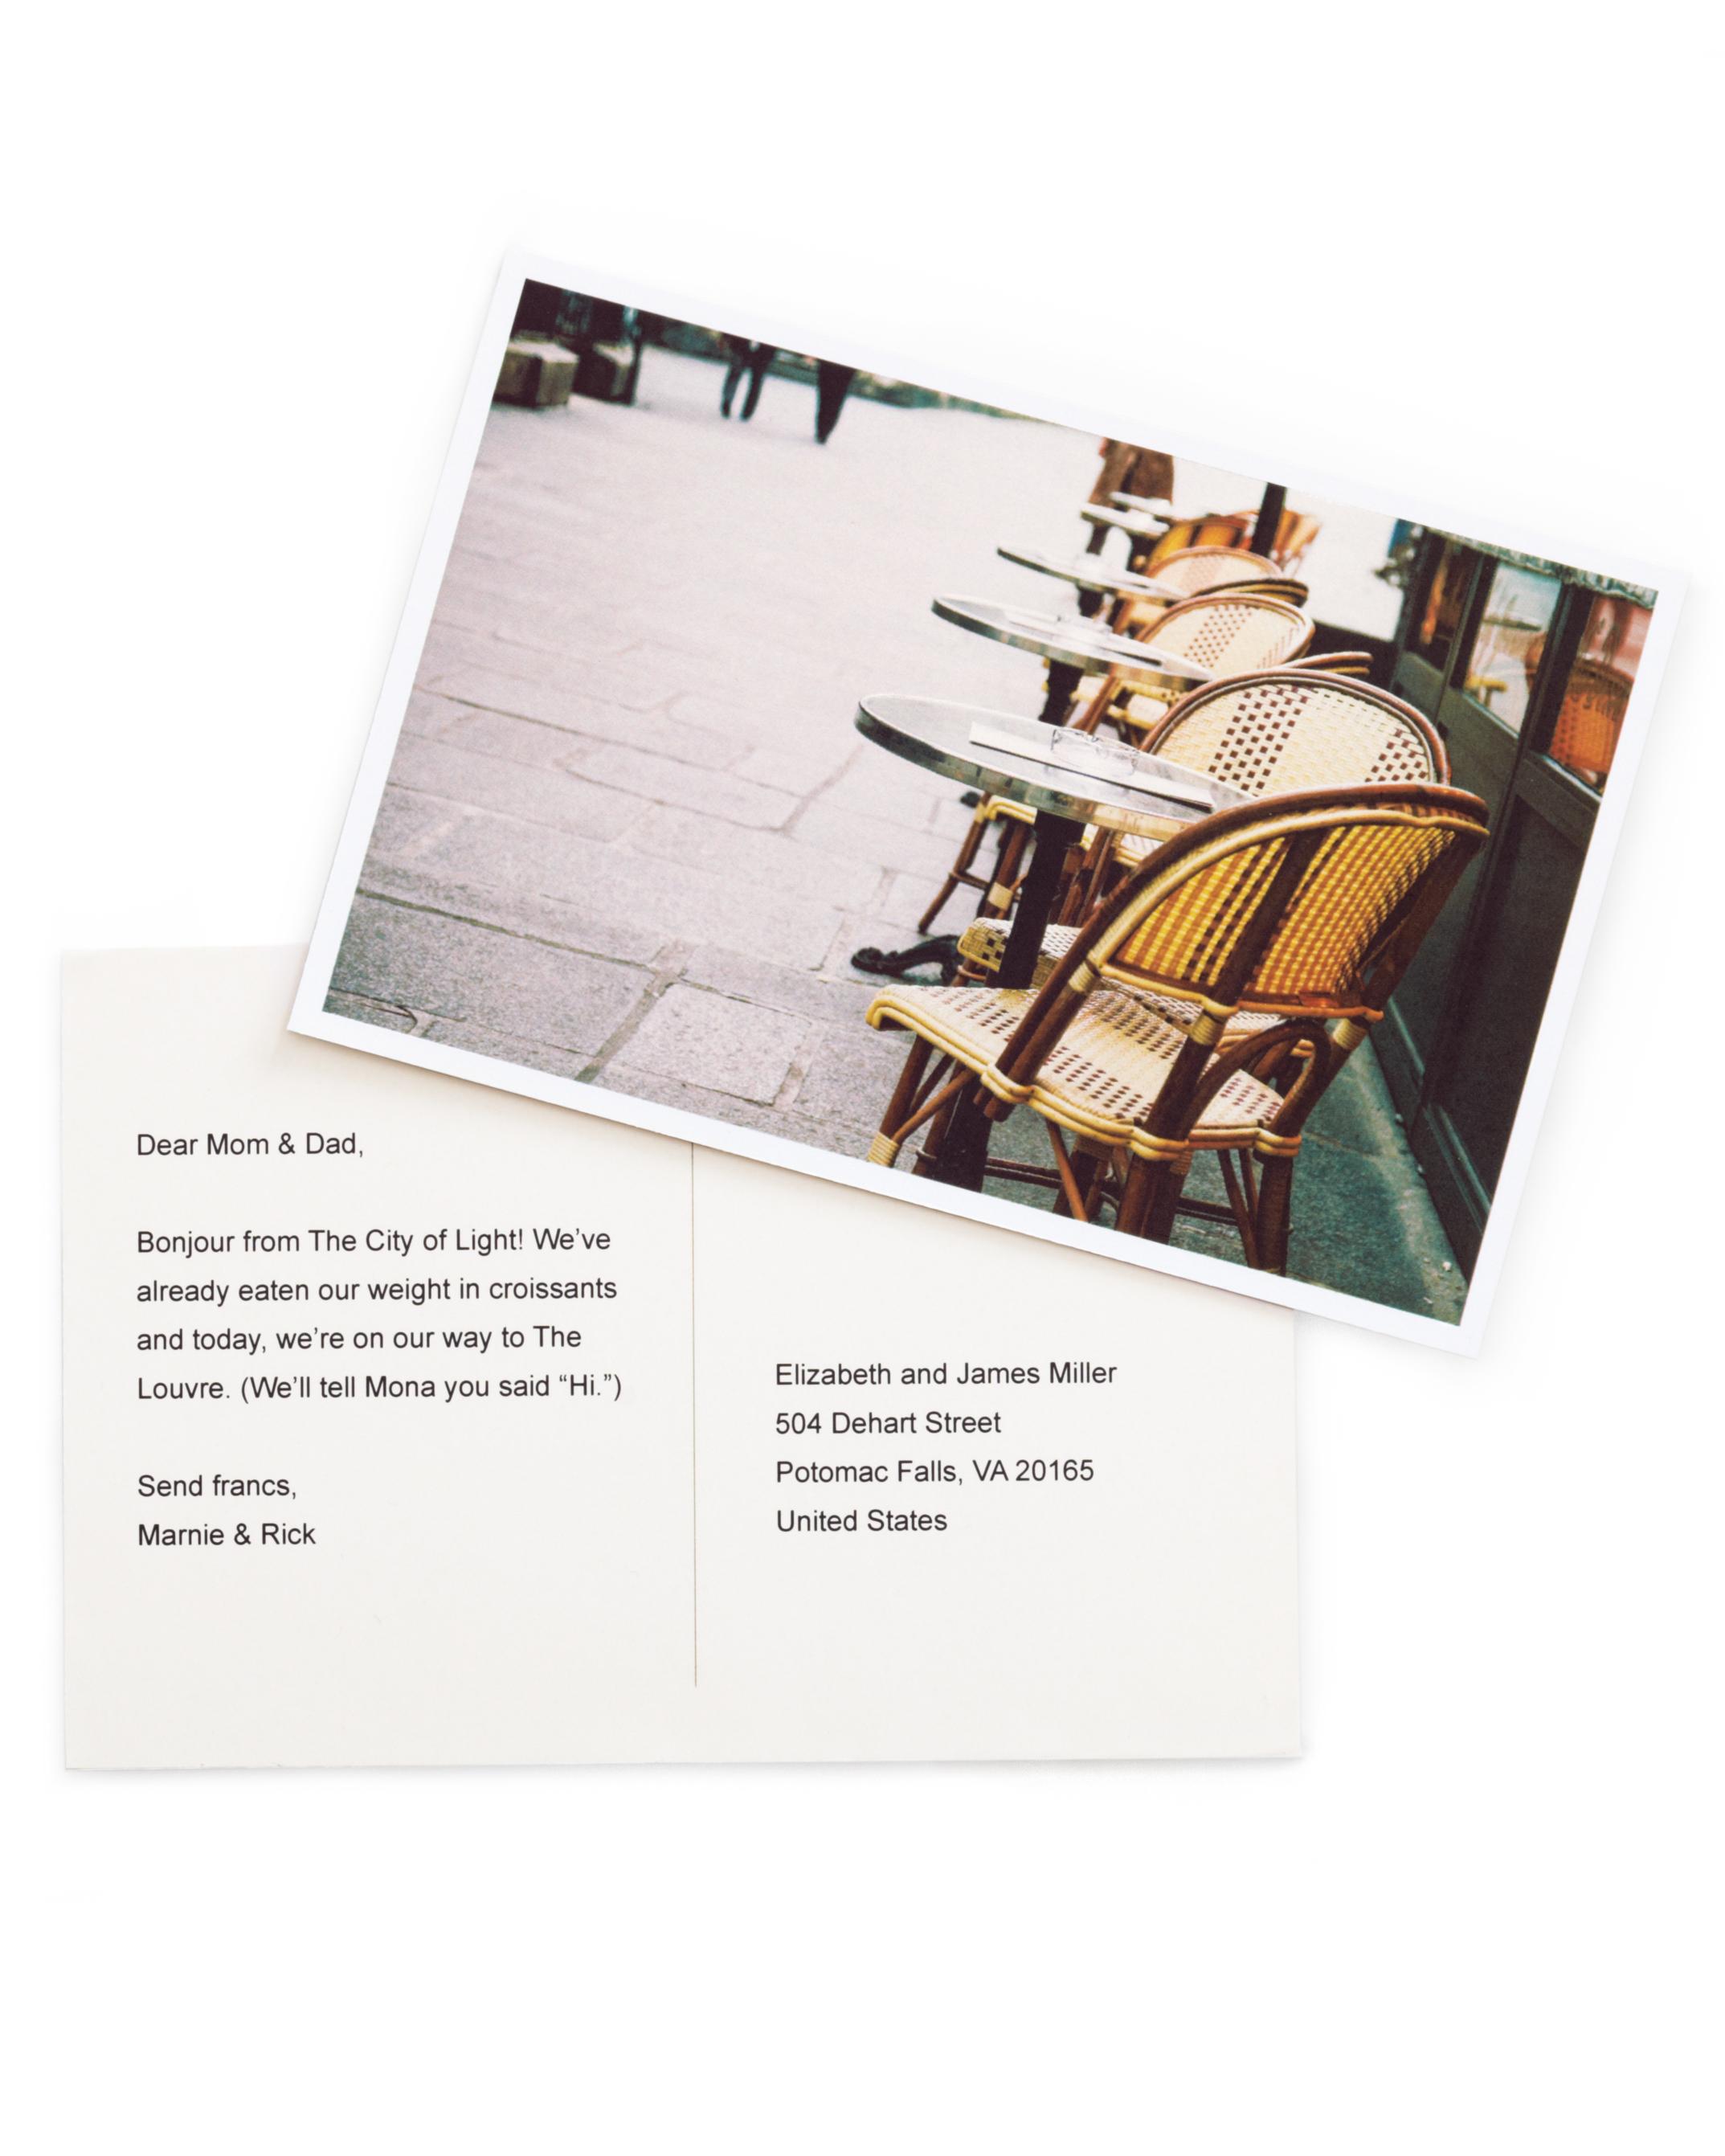 postcards-yk-633-comp1-mwd110177.jpg